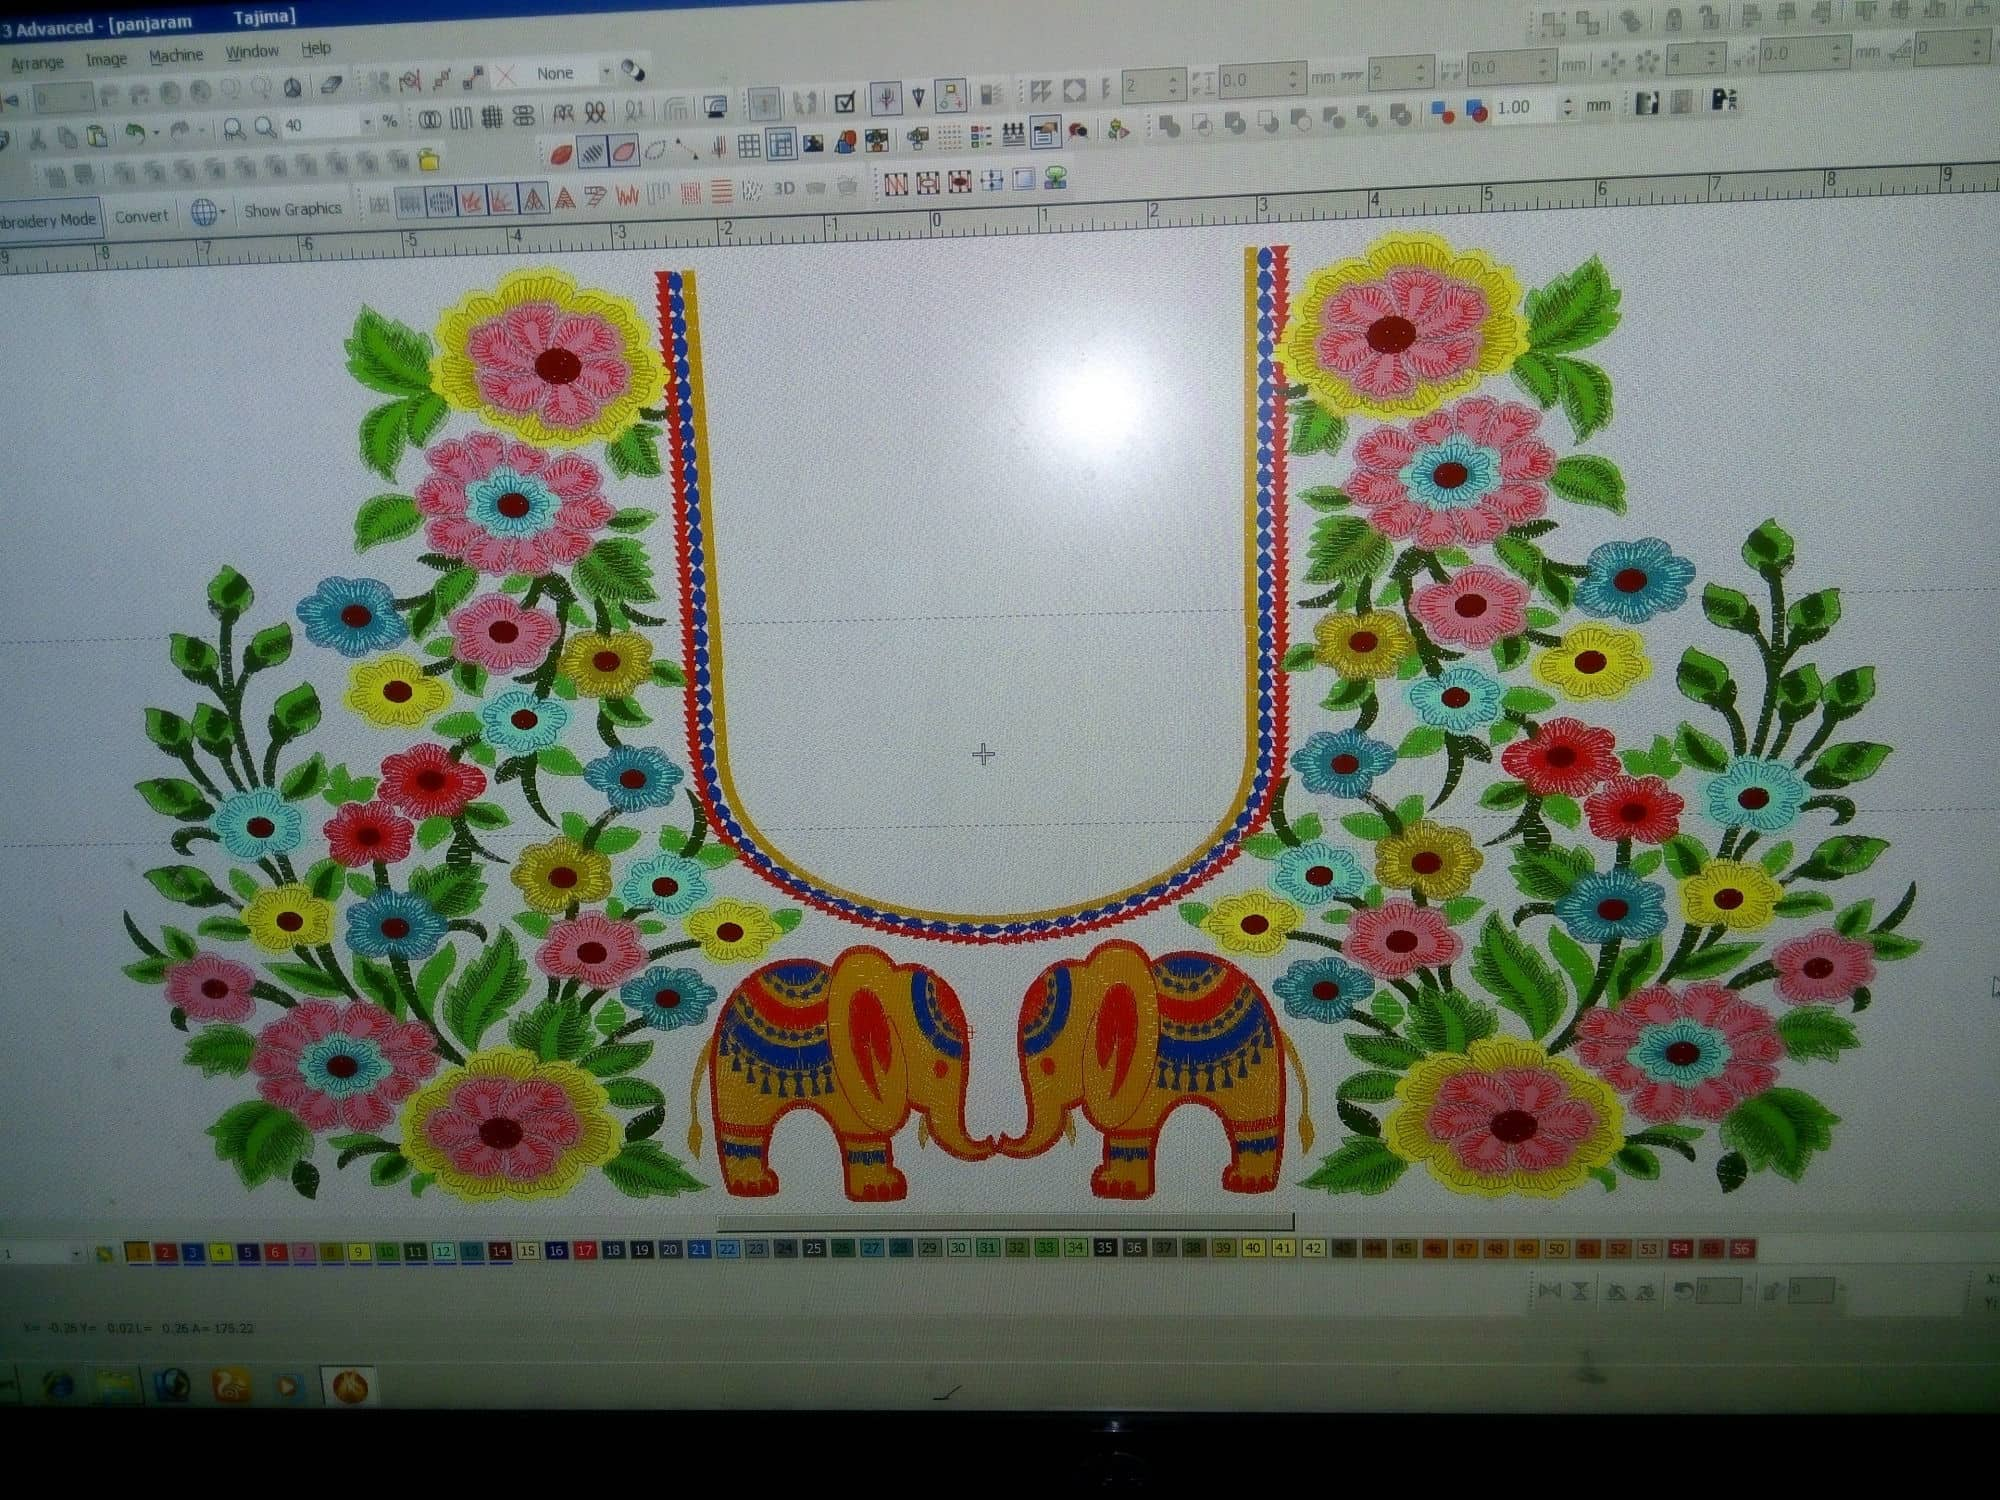 Top Computerised Embroidery Work In Vijayawada Ho Vijayawada Best Commercial Embroidery Works Justdial,Boutique Fashion Designer Studio Interior